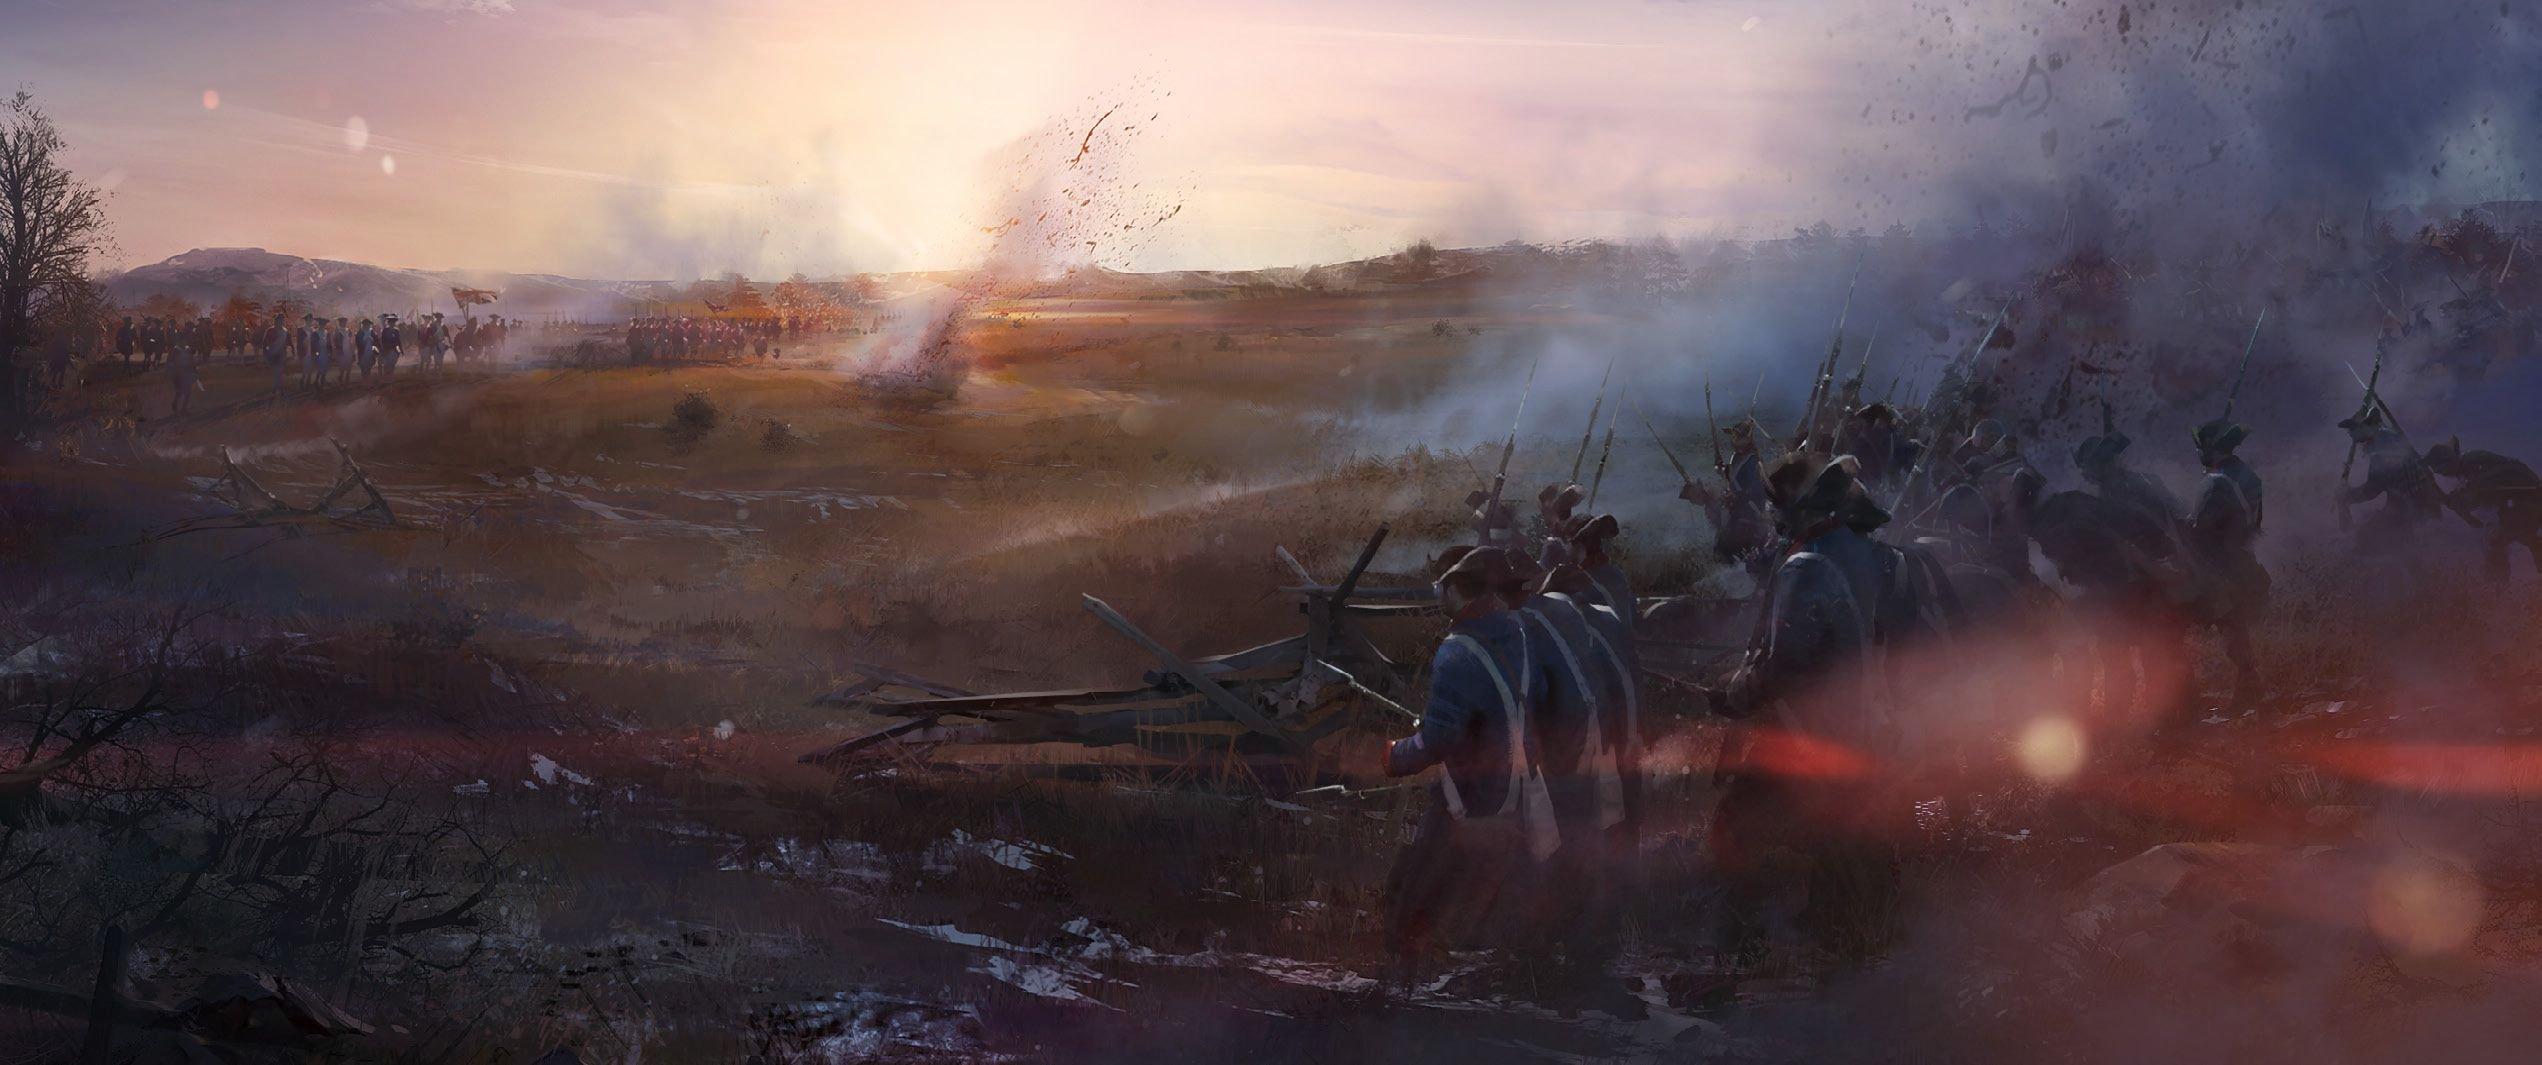 American Revolutionary War Weapons Wikipedia American Revolutionary War